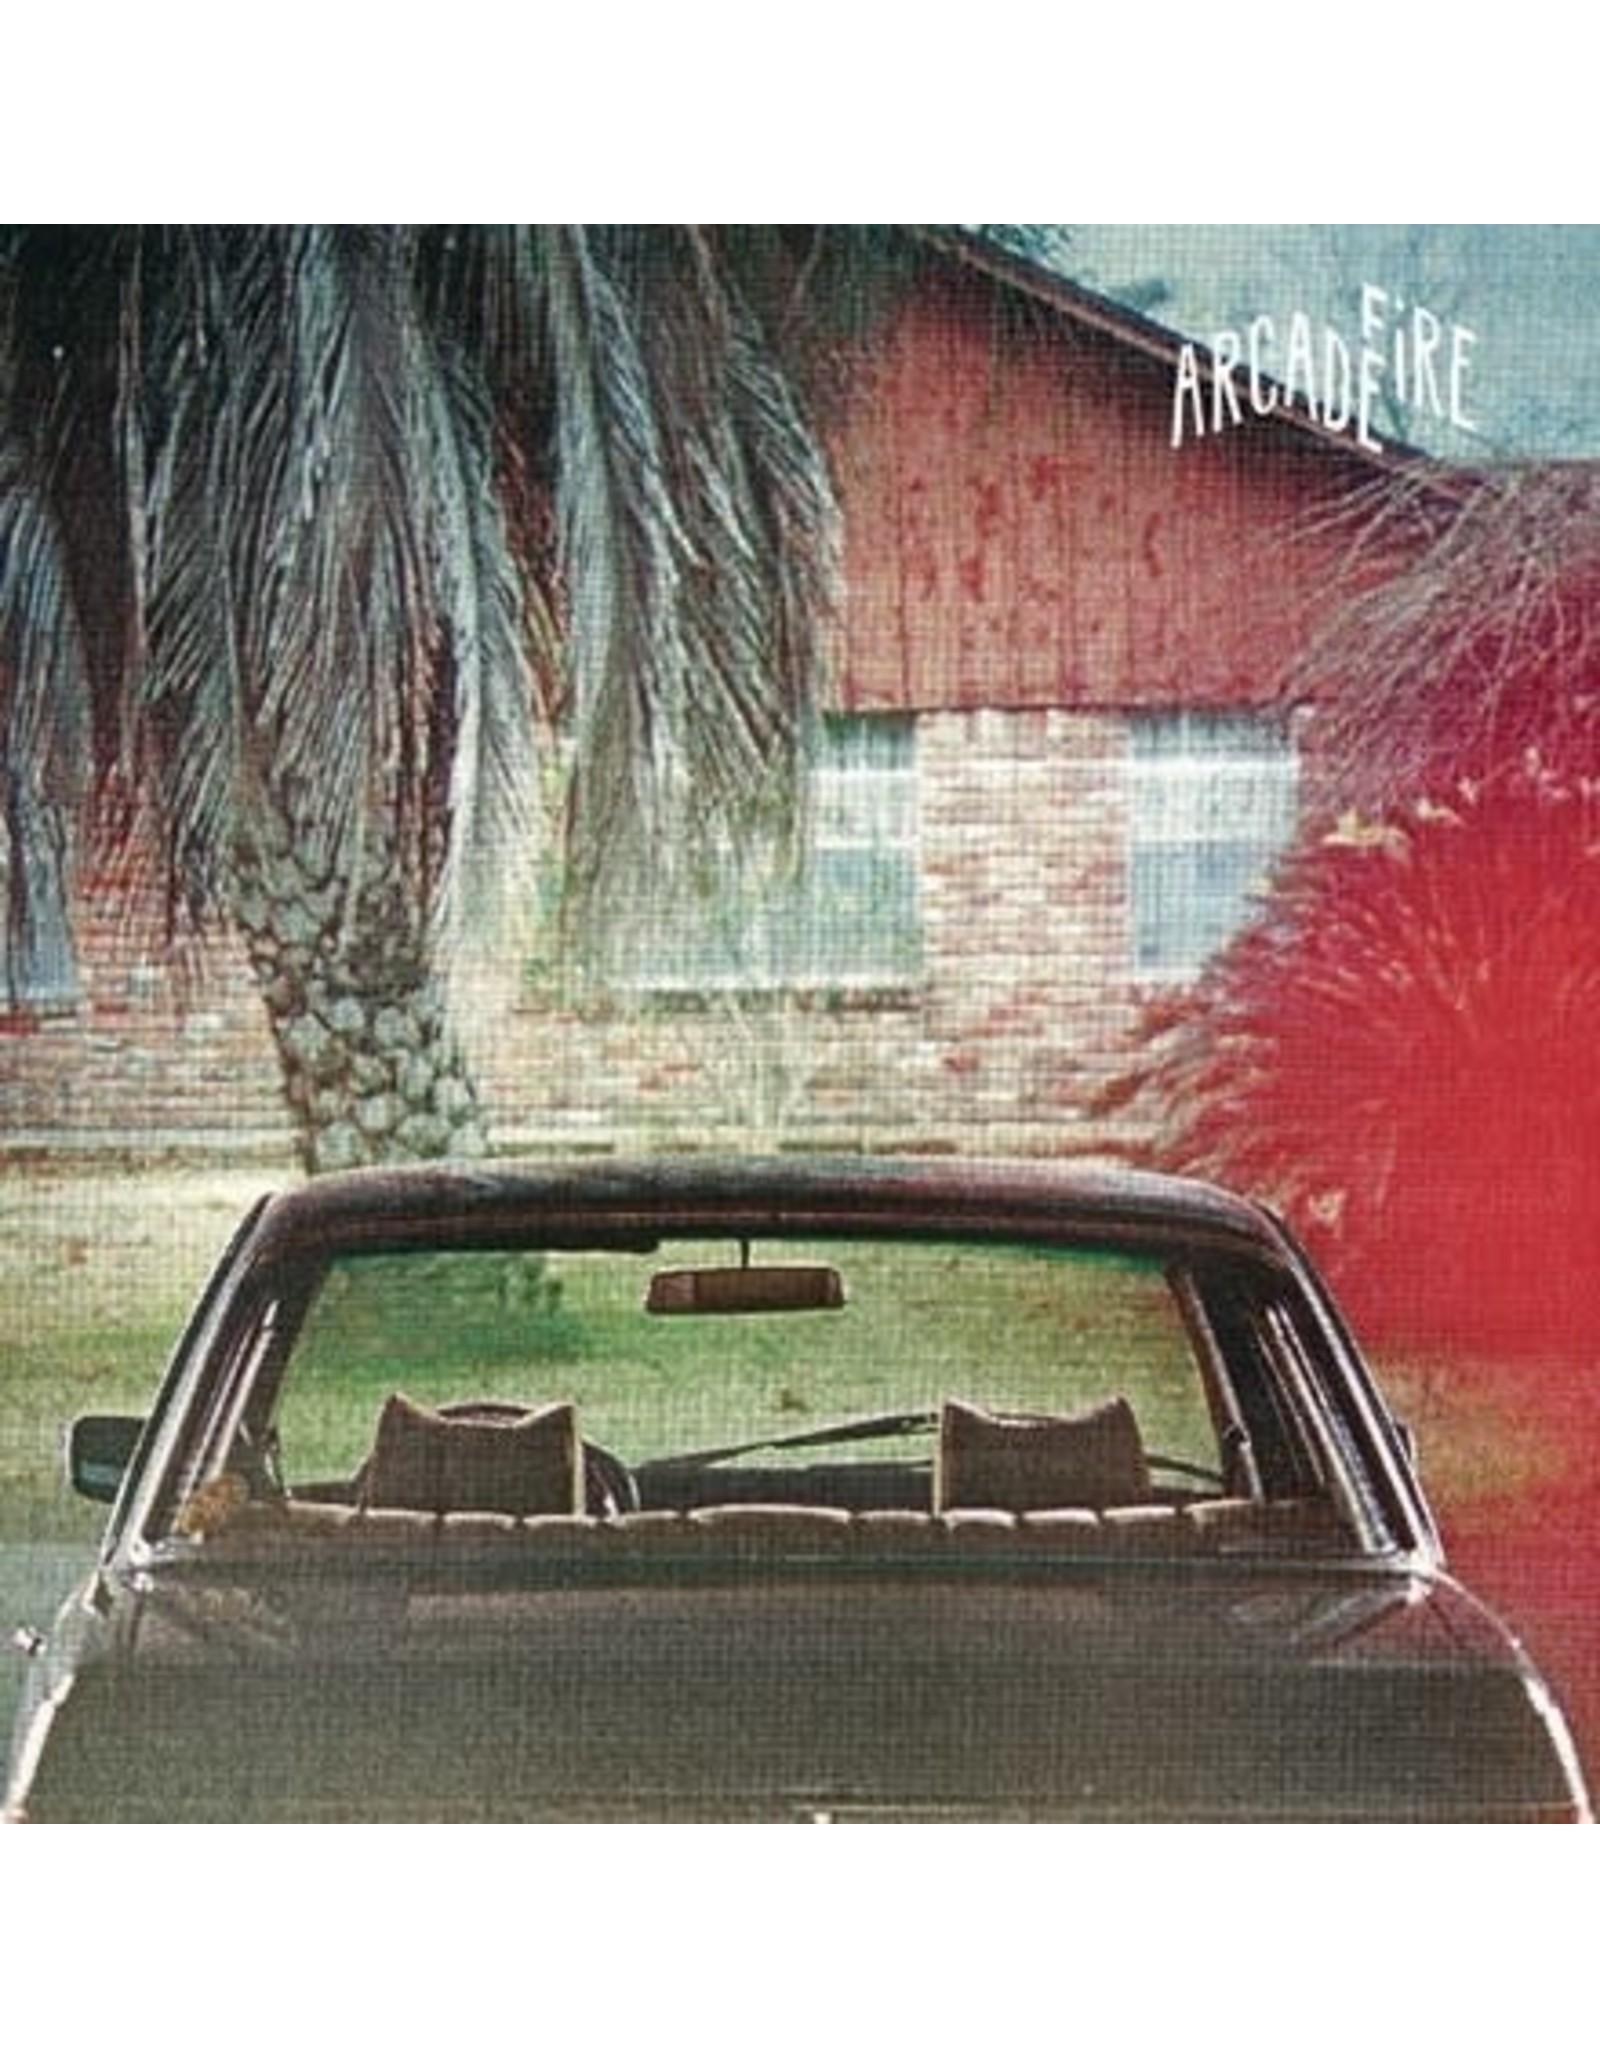 Sonovox Arcade Fire: Suburbs LP